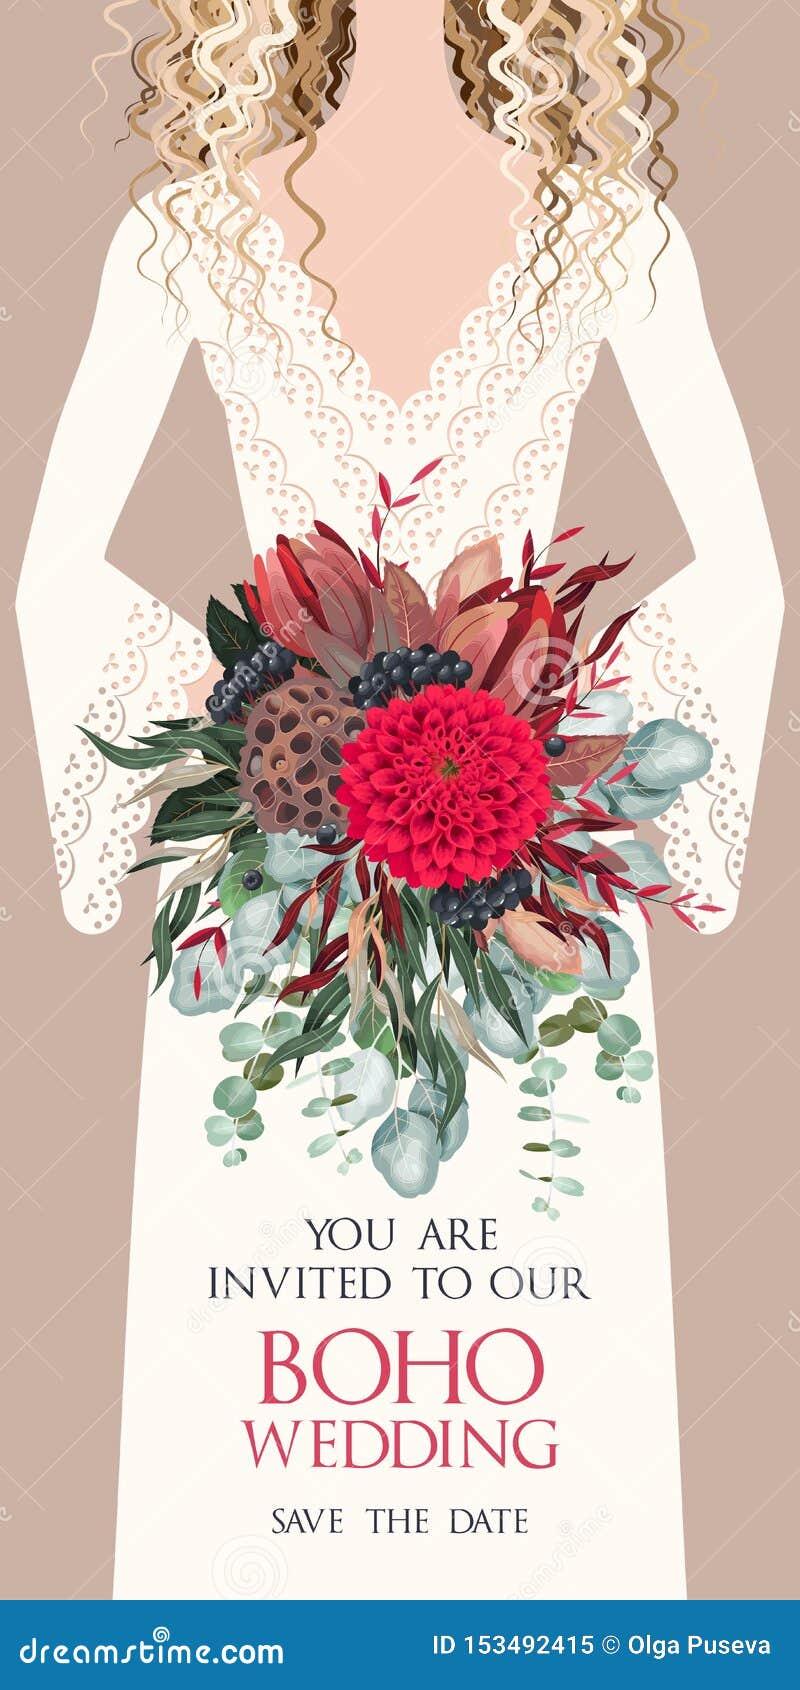 Vector Card With Bride And Wedding Bouquet Stock Vector Illustration Of Eucalyptus Bohemian 153492415